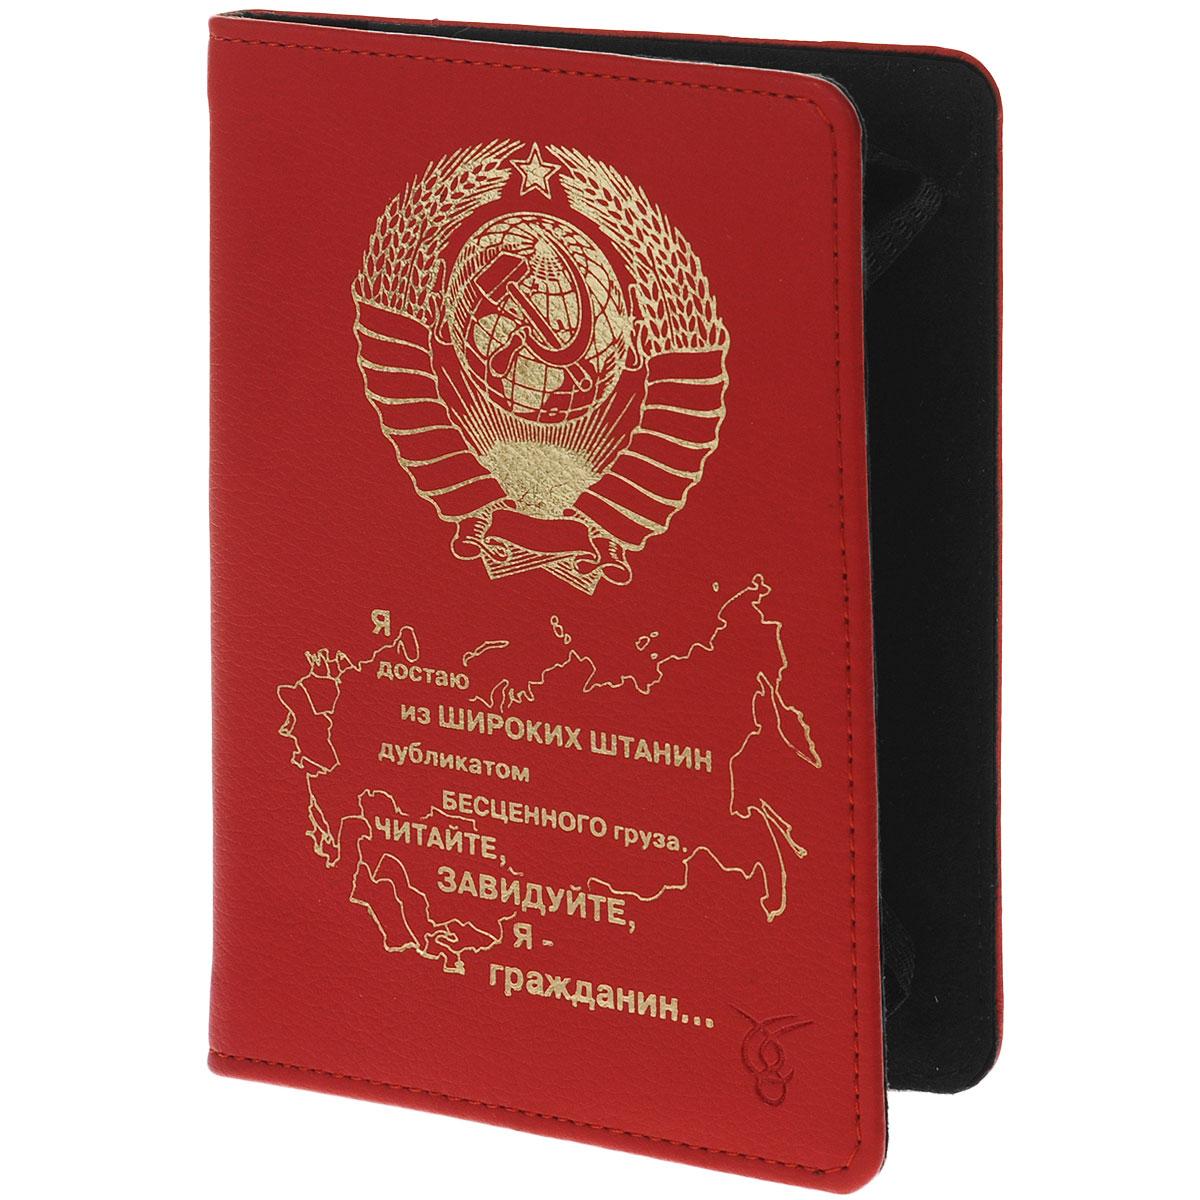 Vivacase Soviet чехол для планшетов и e-book 6, Red (VUC-CSV06-r) чехлы для планшетов 10 дюймов украина